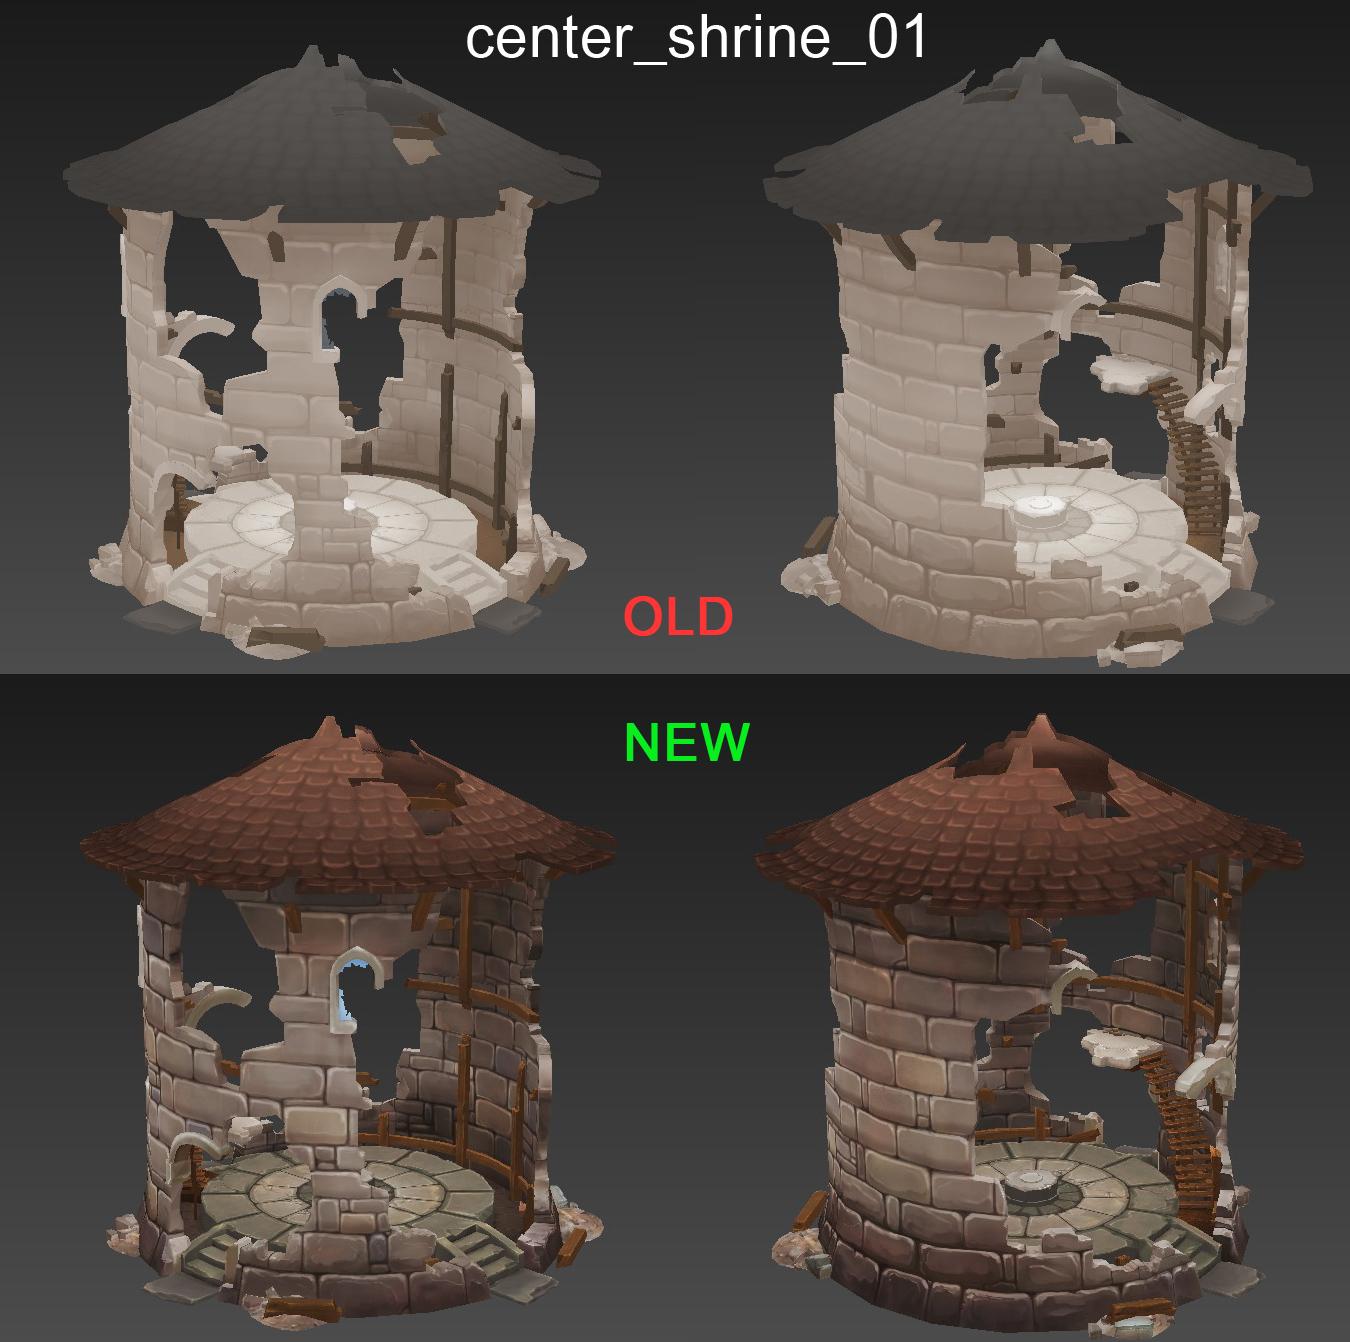 center shrine 01